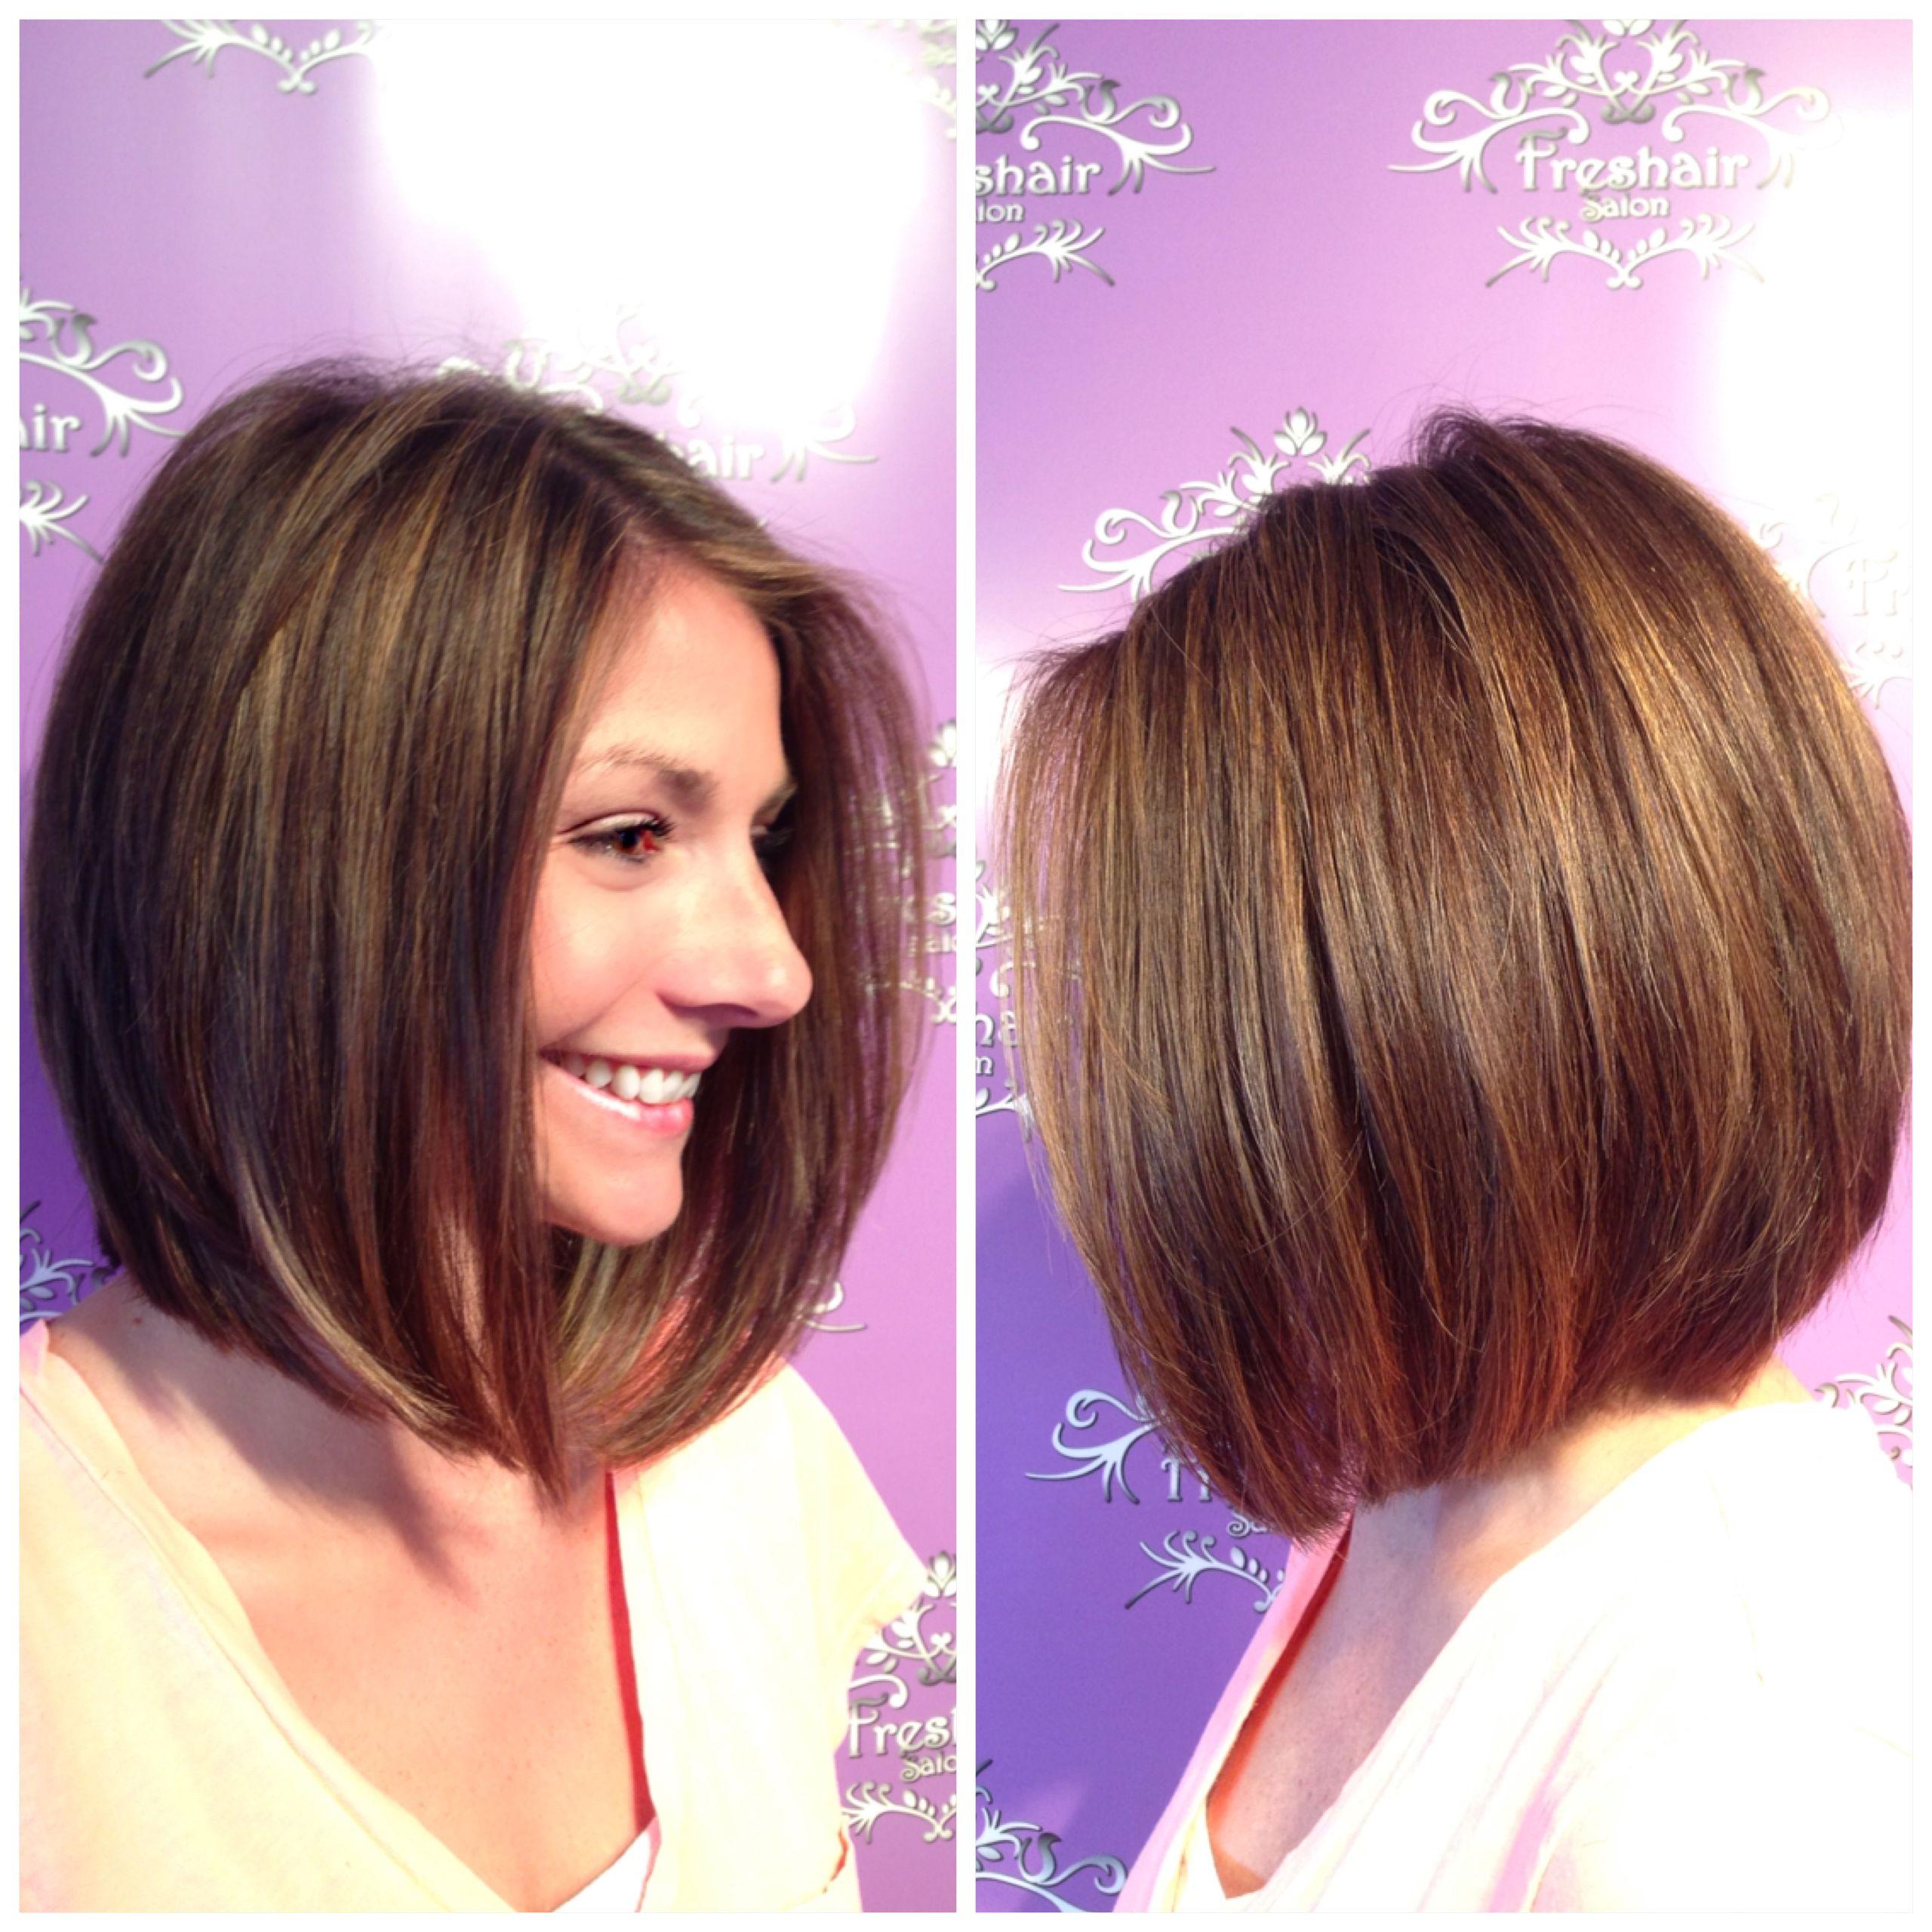 A Line Bob With Golden Highlights And Lowlights Stylist Shelby Lambidonis Freshairsalon Freshairblowoutbar Keune Keuneusa B Hair Hair Styles Hair Makeup